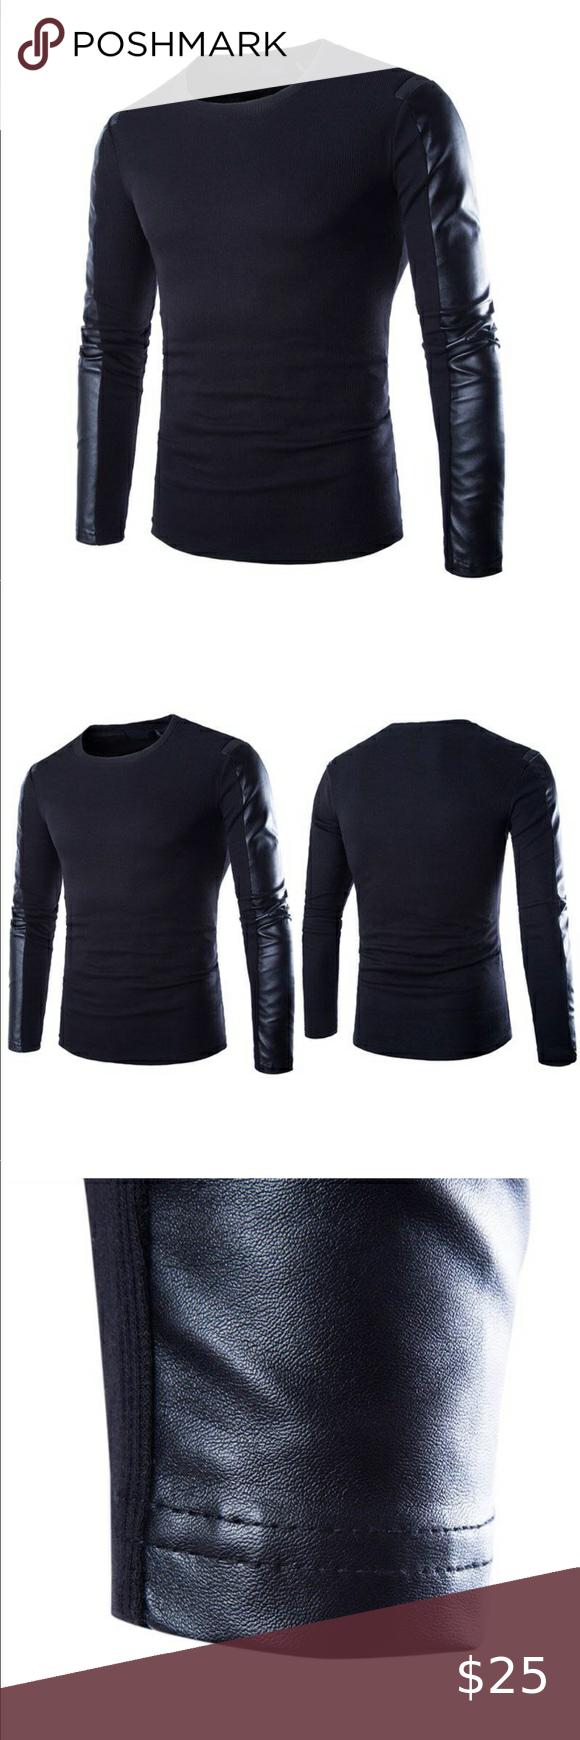 Host Pick Men S Aowo7s Long Sleeve Shirt Long Sleeve Shirts Clothes Design Fashion